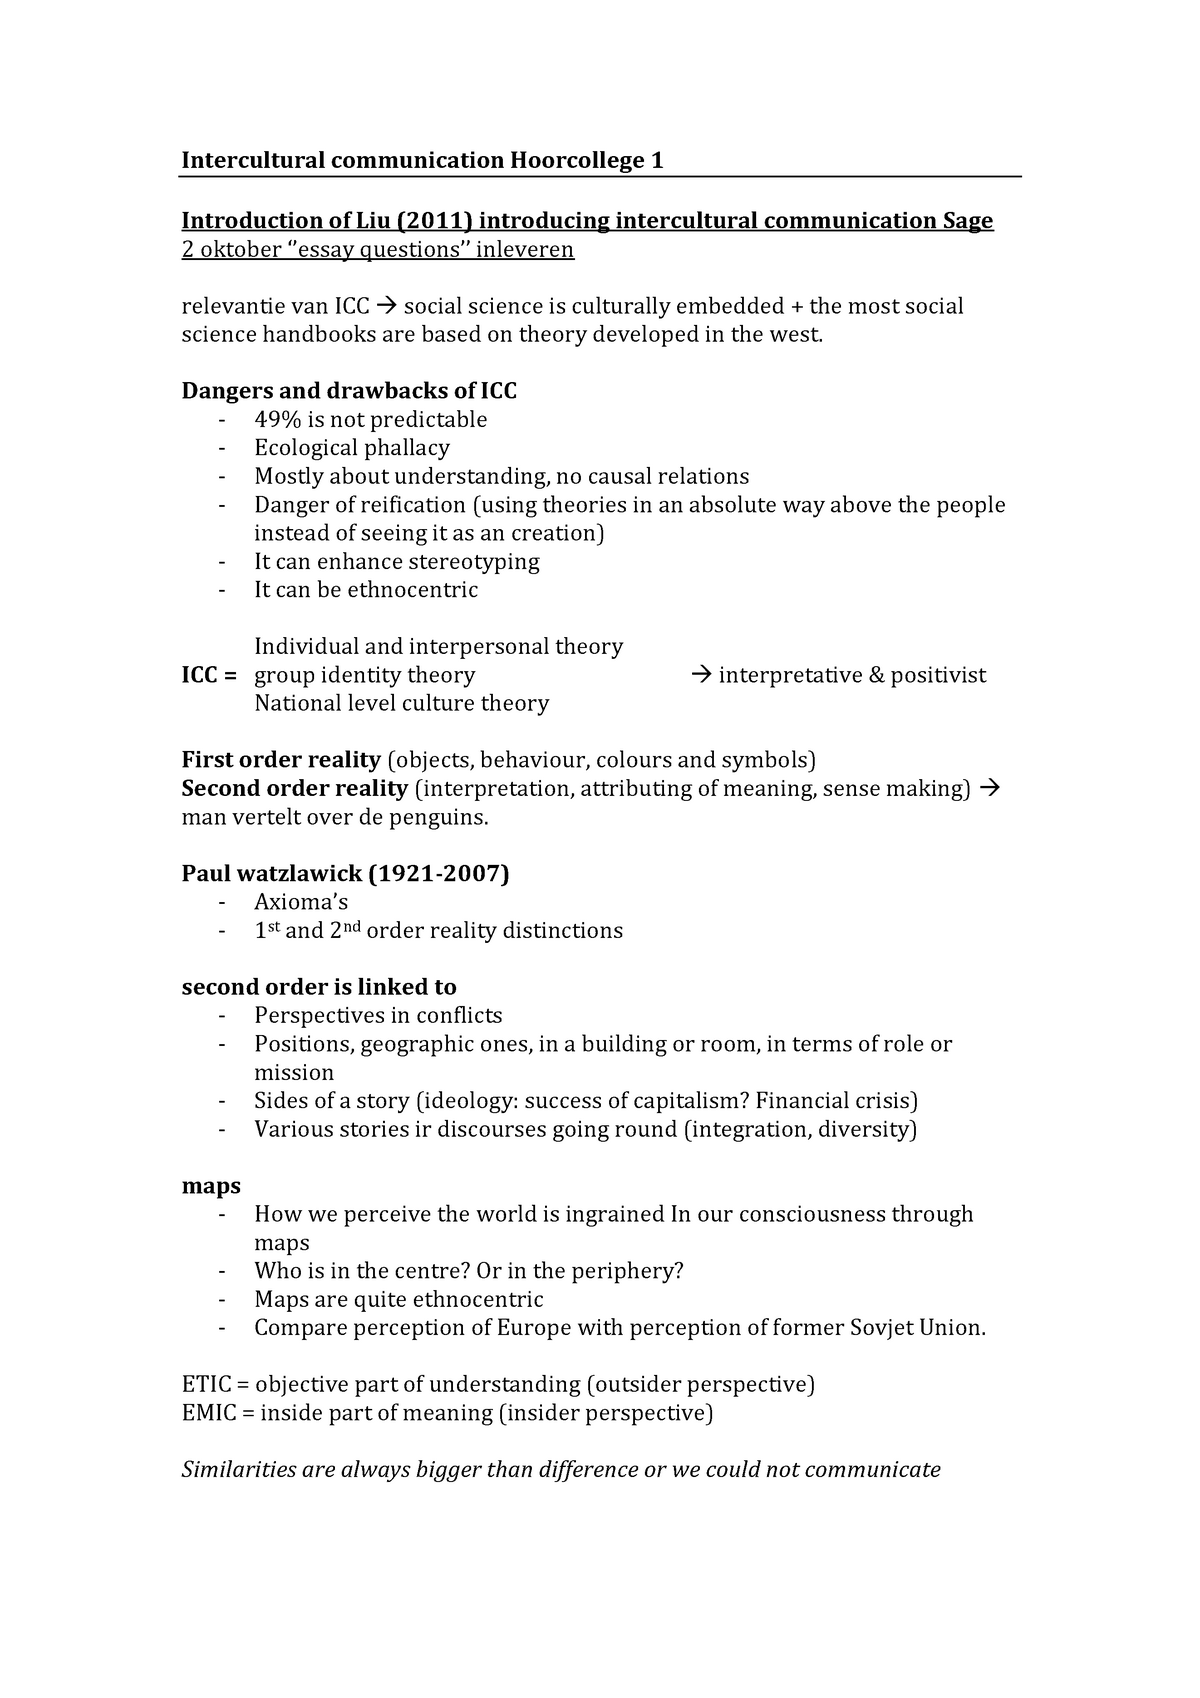 Intercultural Communication - Lecture notes, lecture 1 - 9